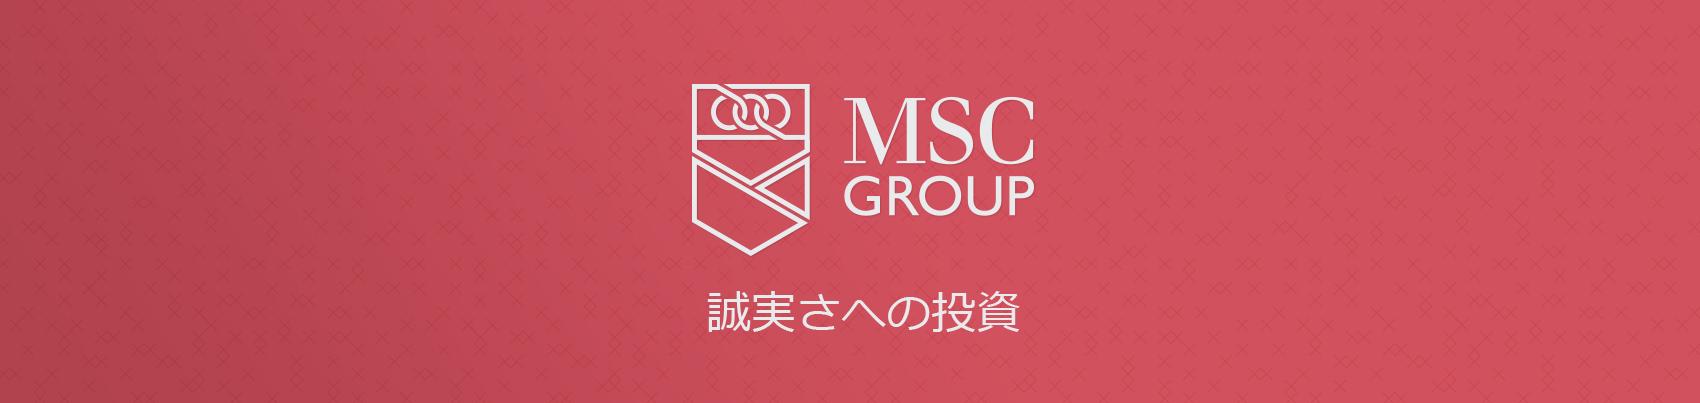 MSCGroup-mid-banner-jp